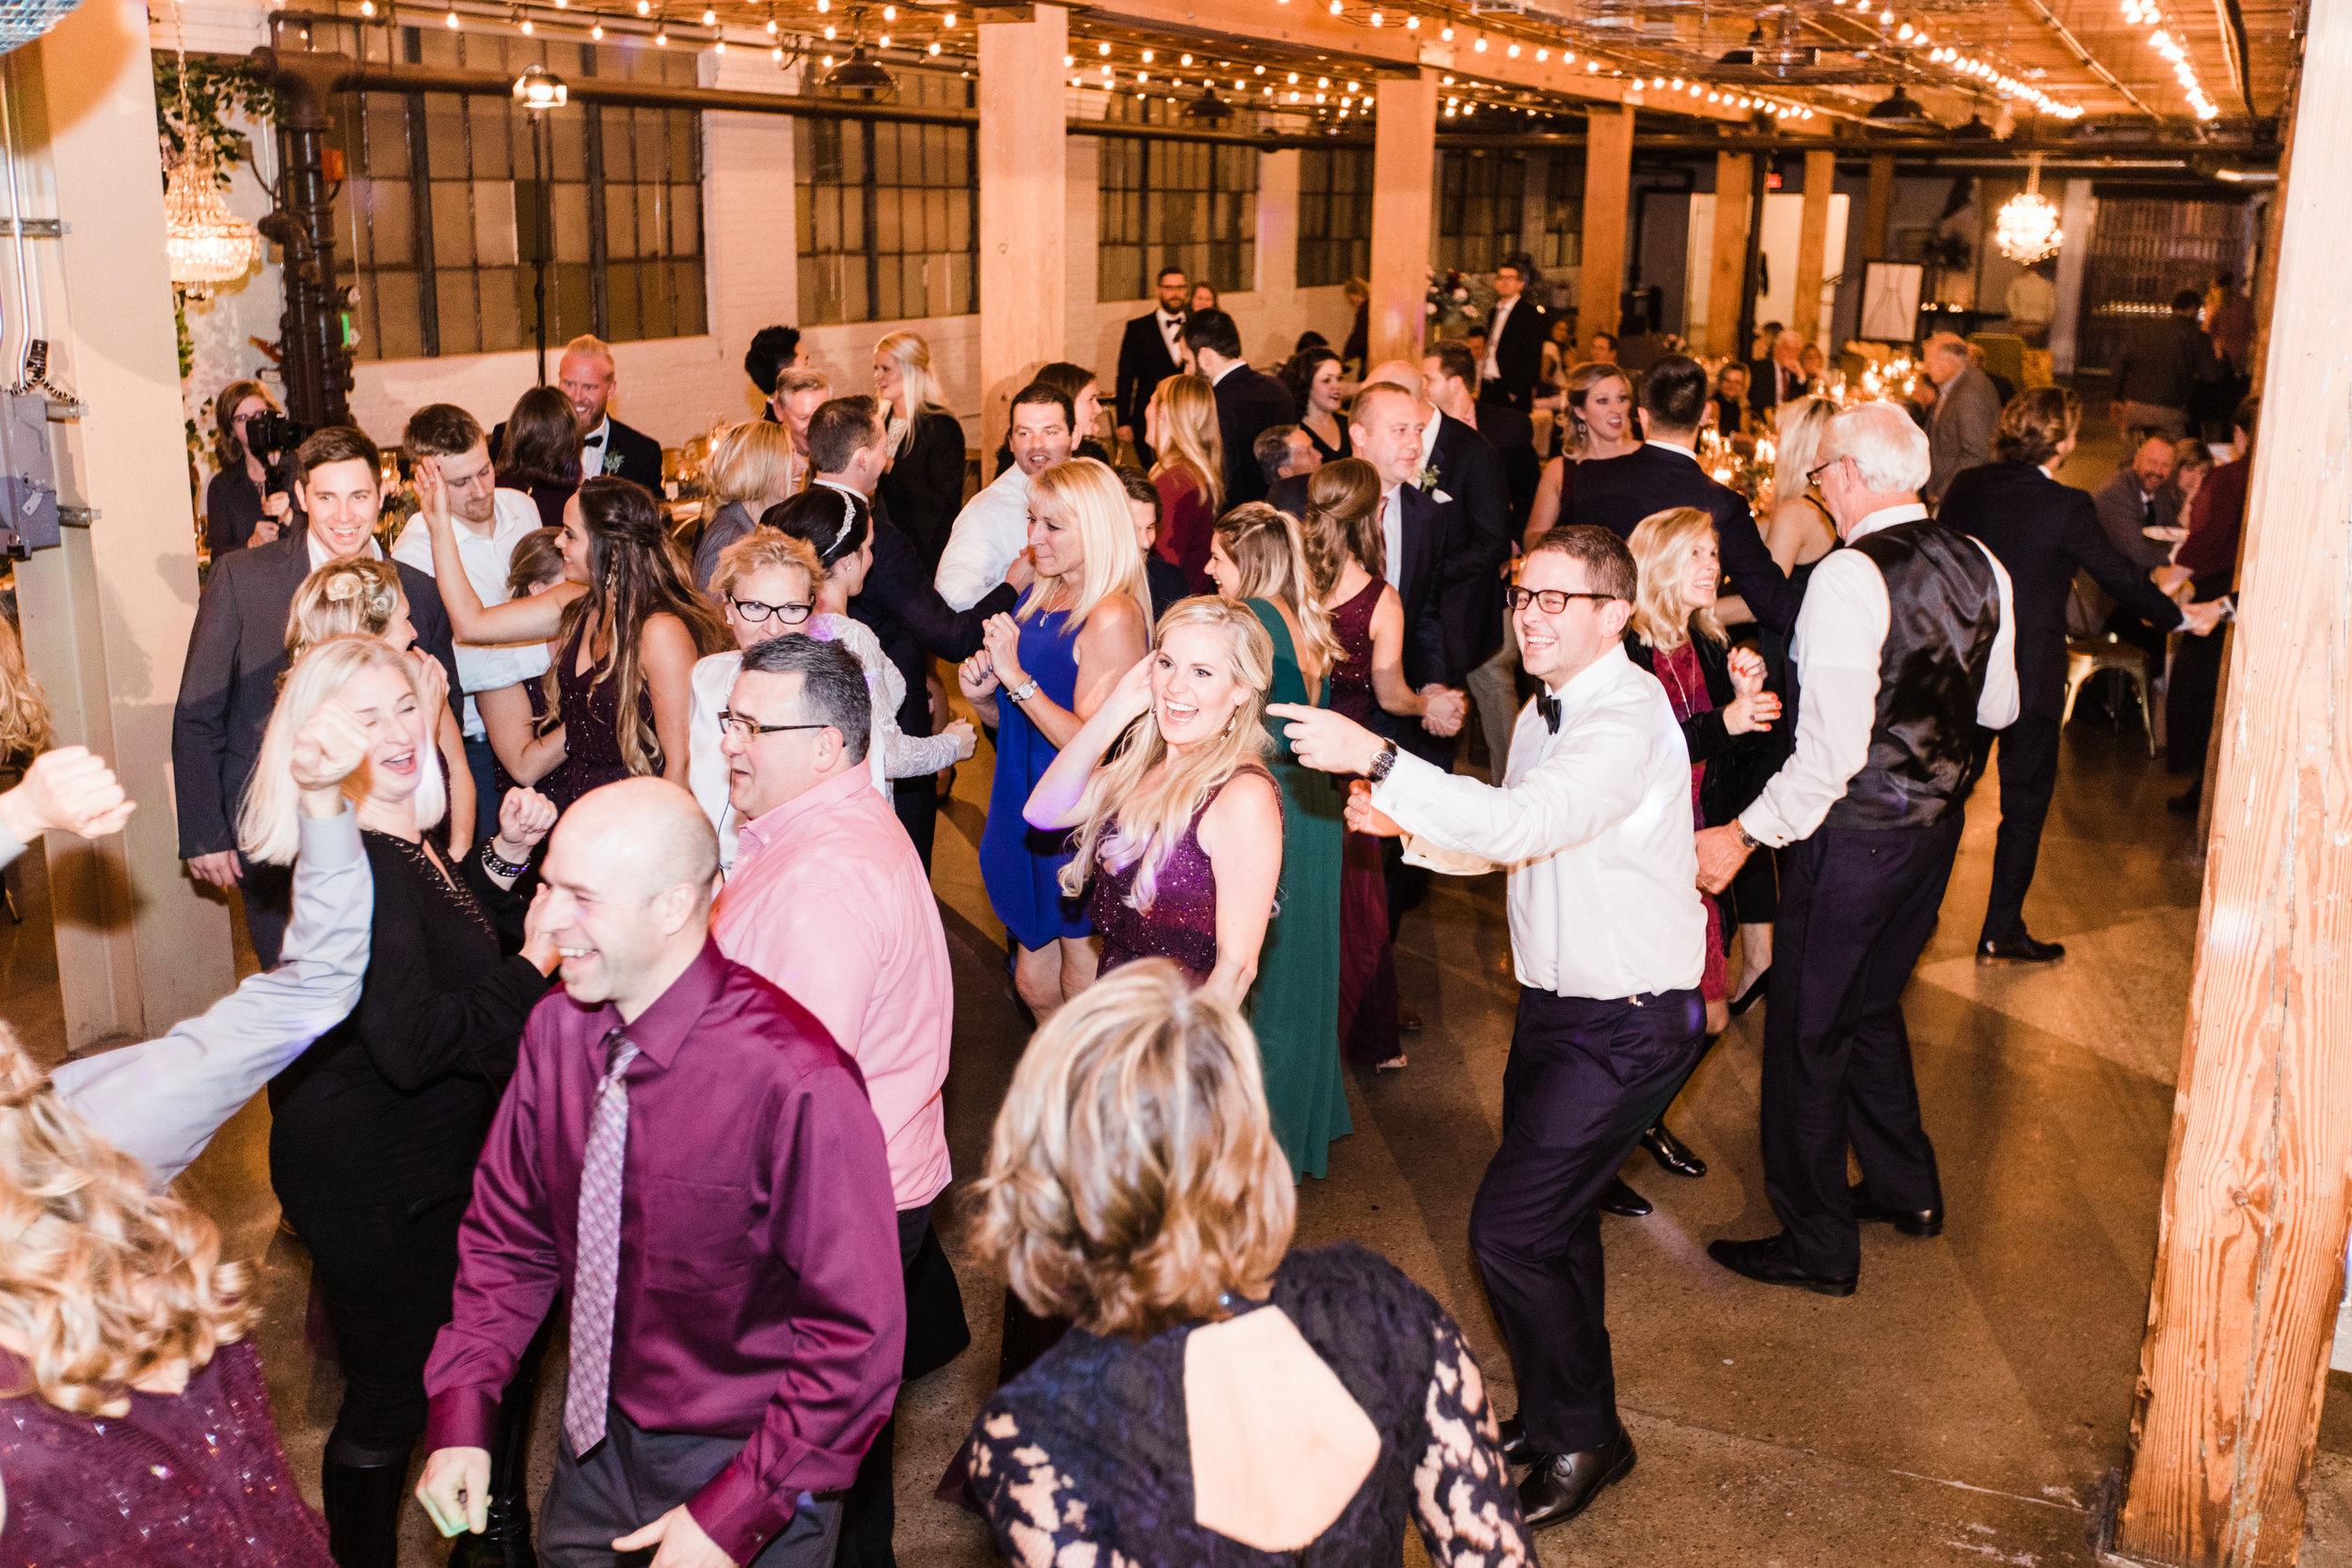 Vogelzang+Wedding+Reception+Dancing2-48.jpg